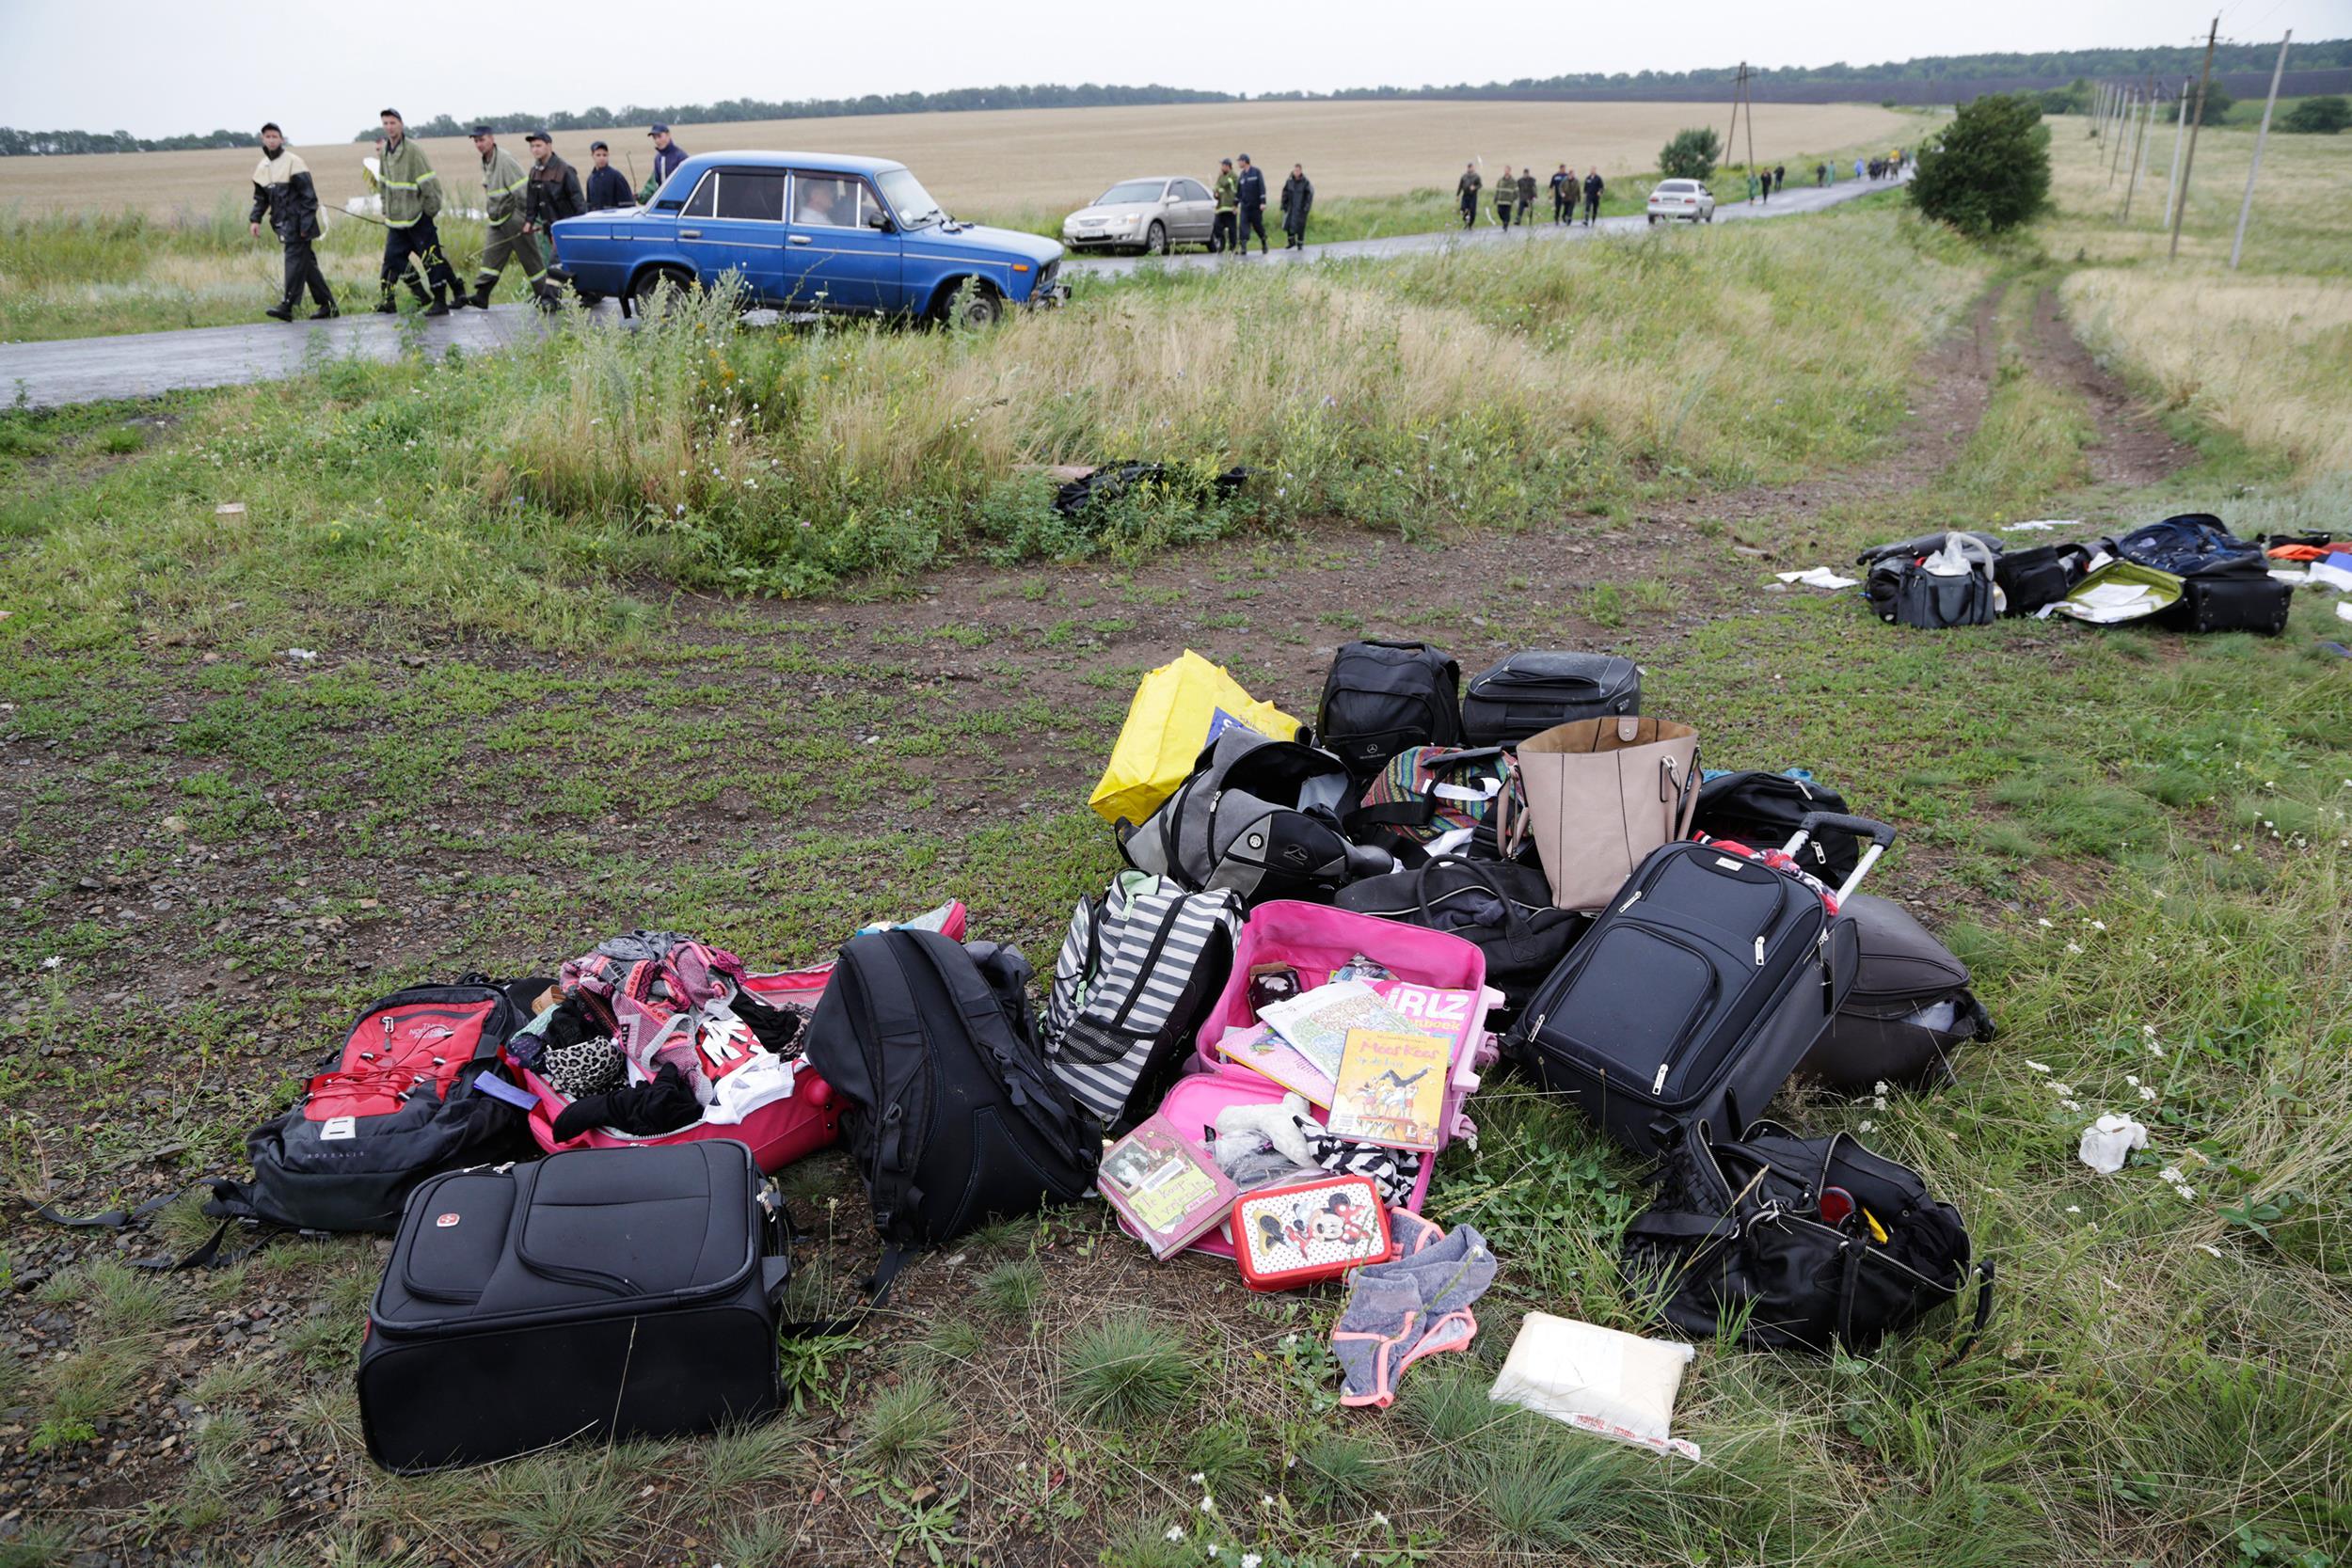 Plane Crash Bodies Photos Reports of mh17 victims'